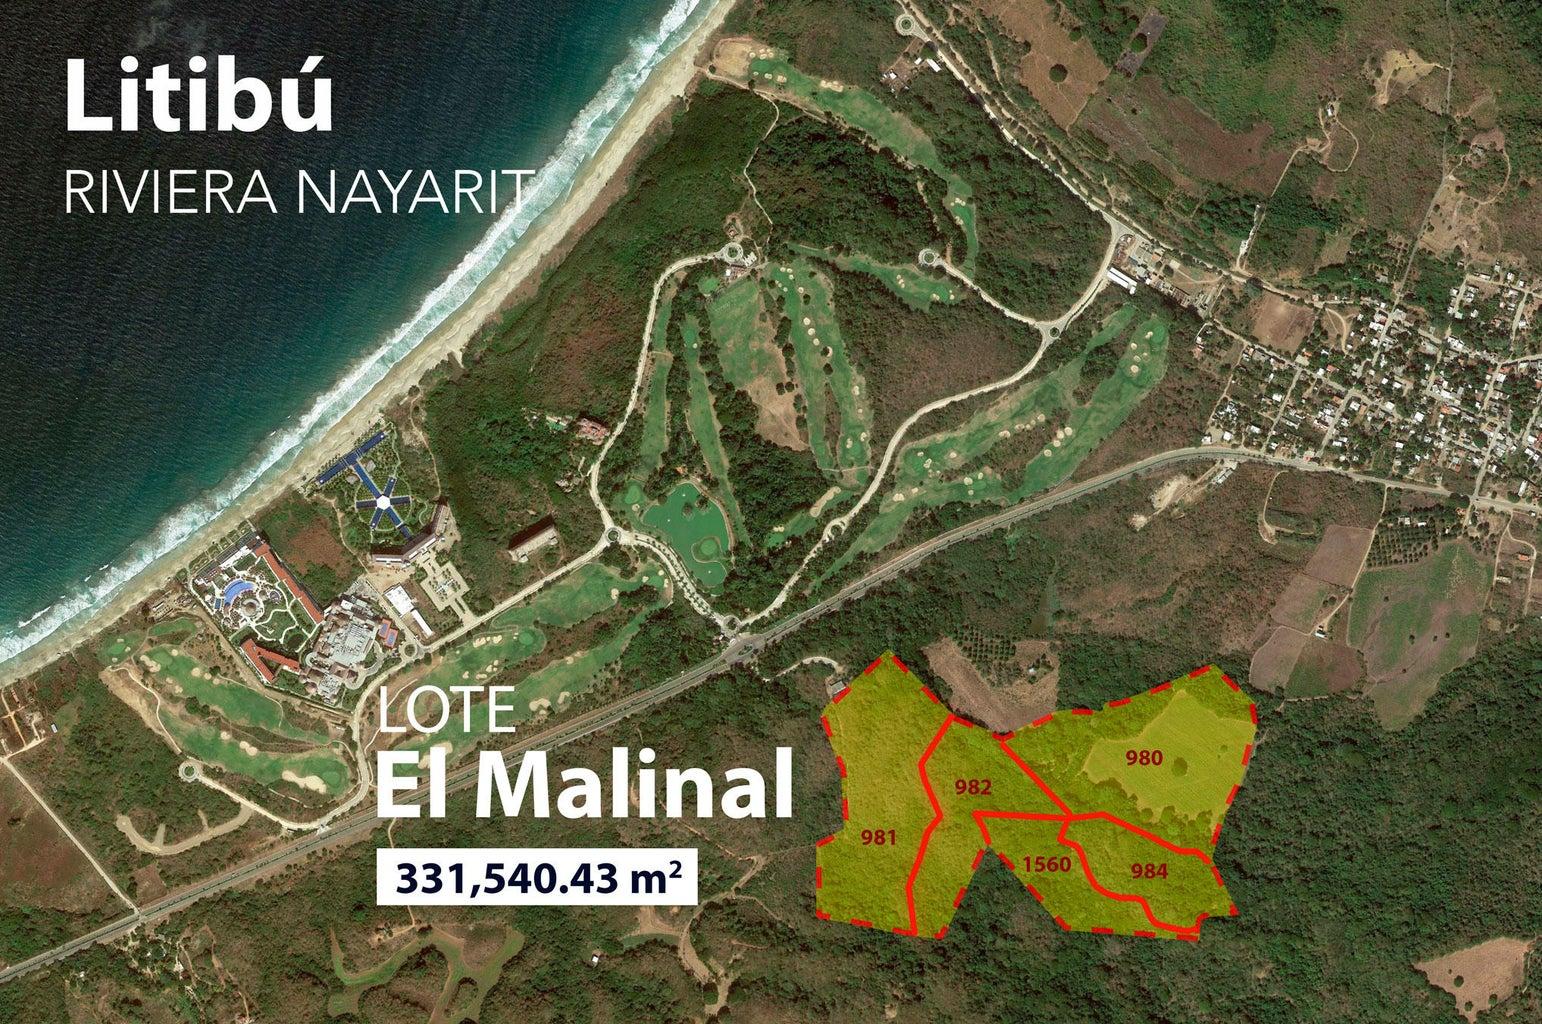 Ubicacion-lotee-El-Malinal